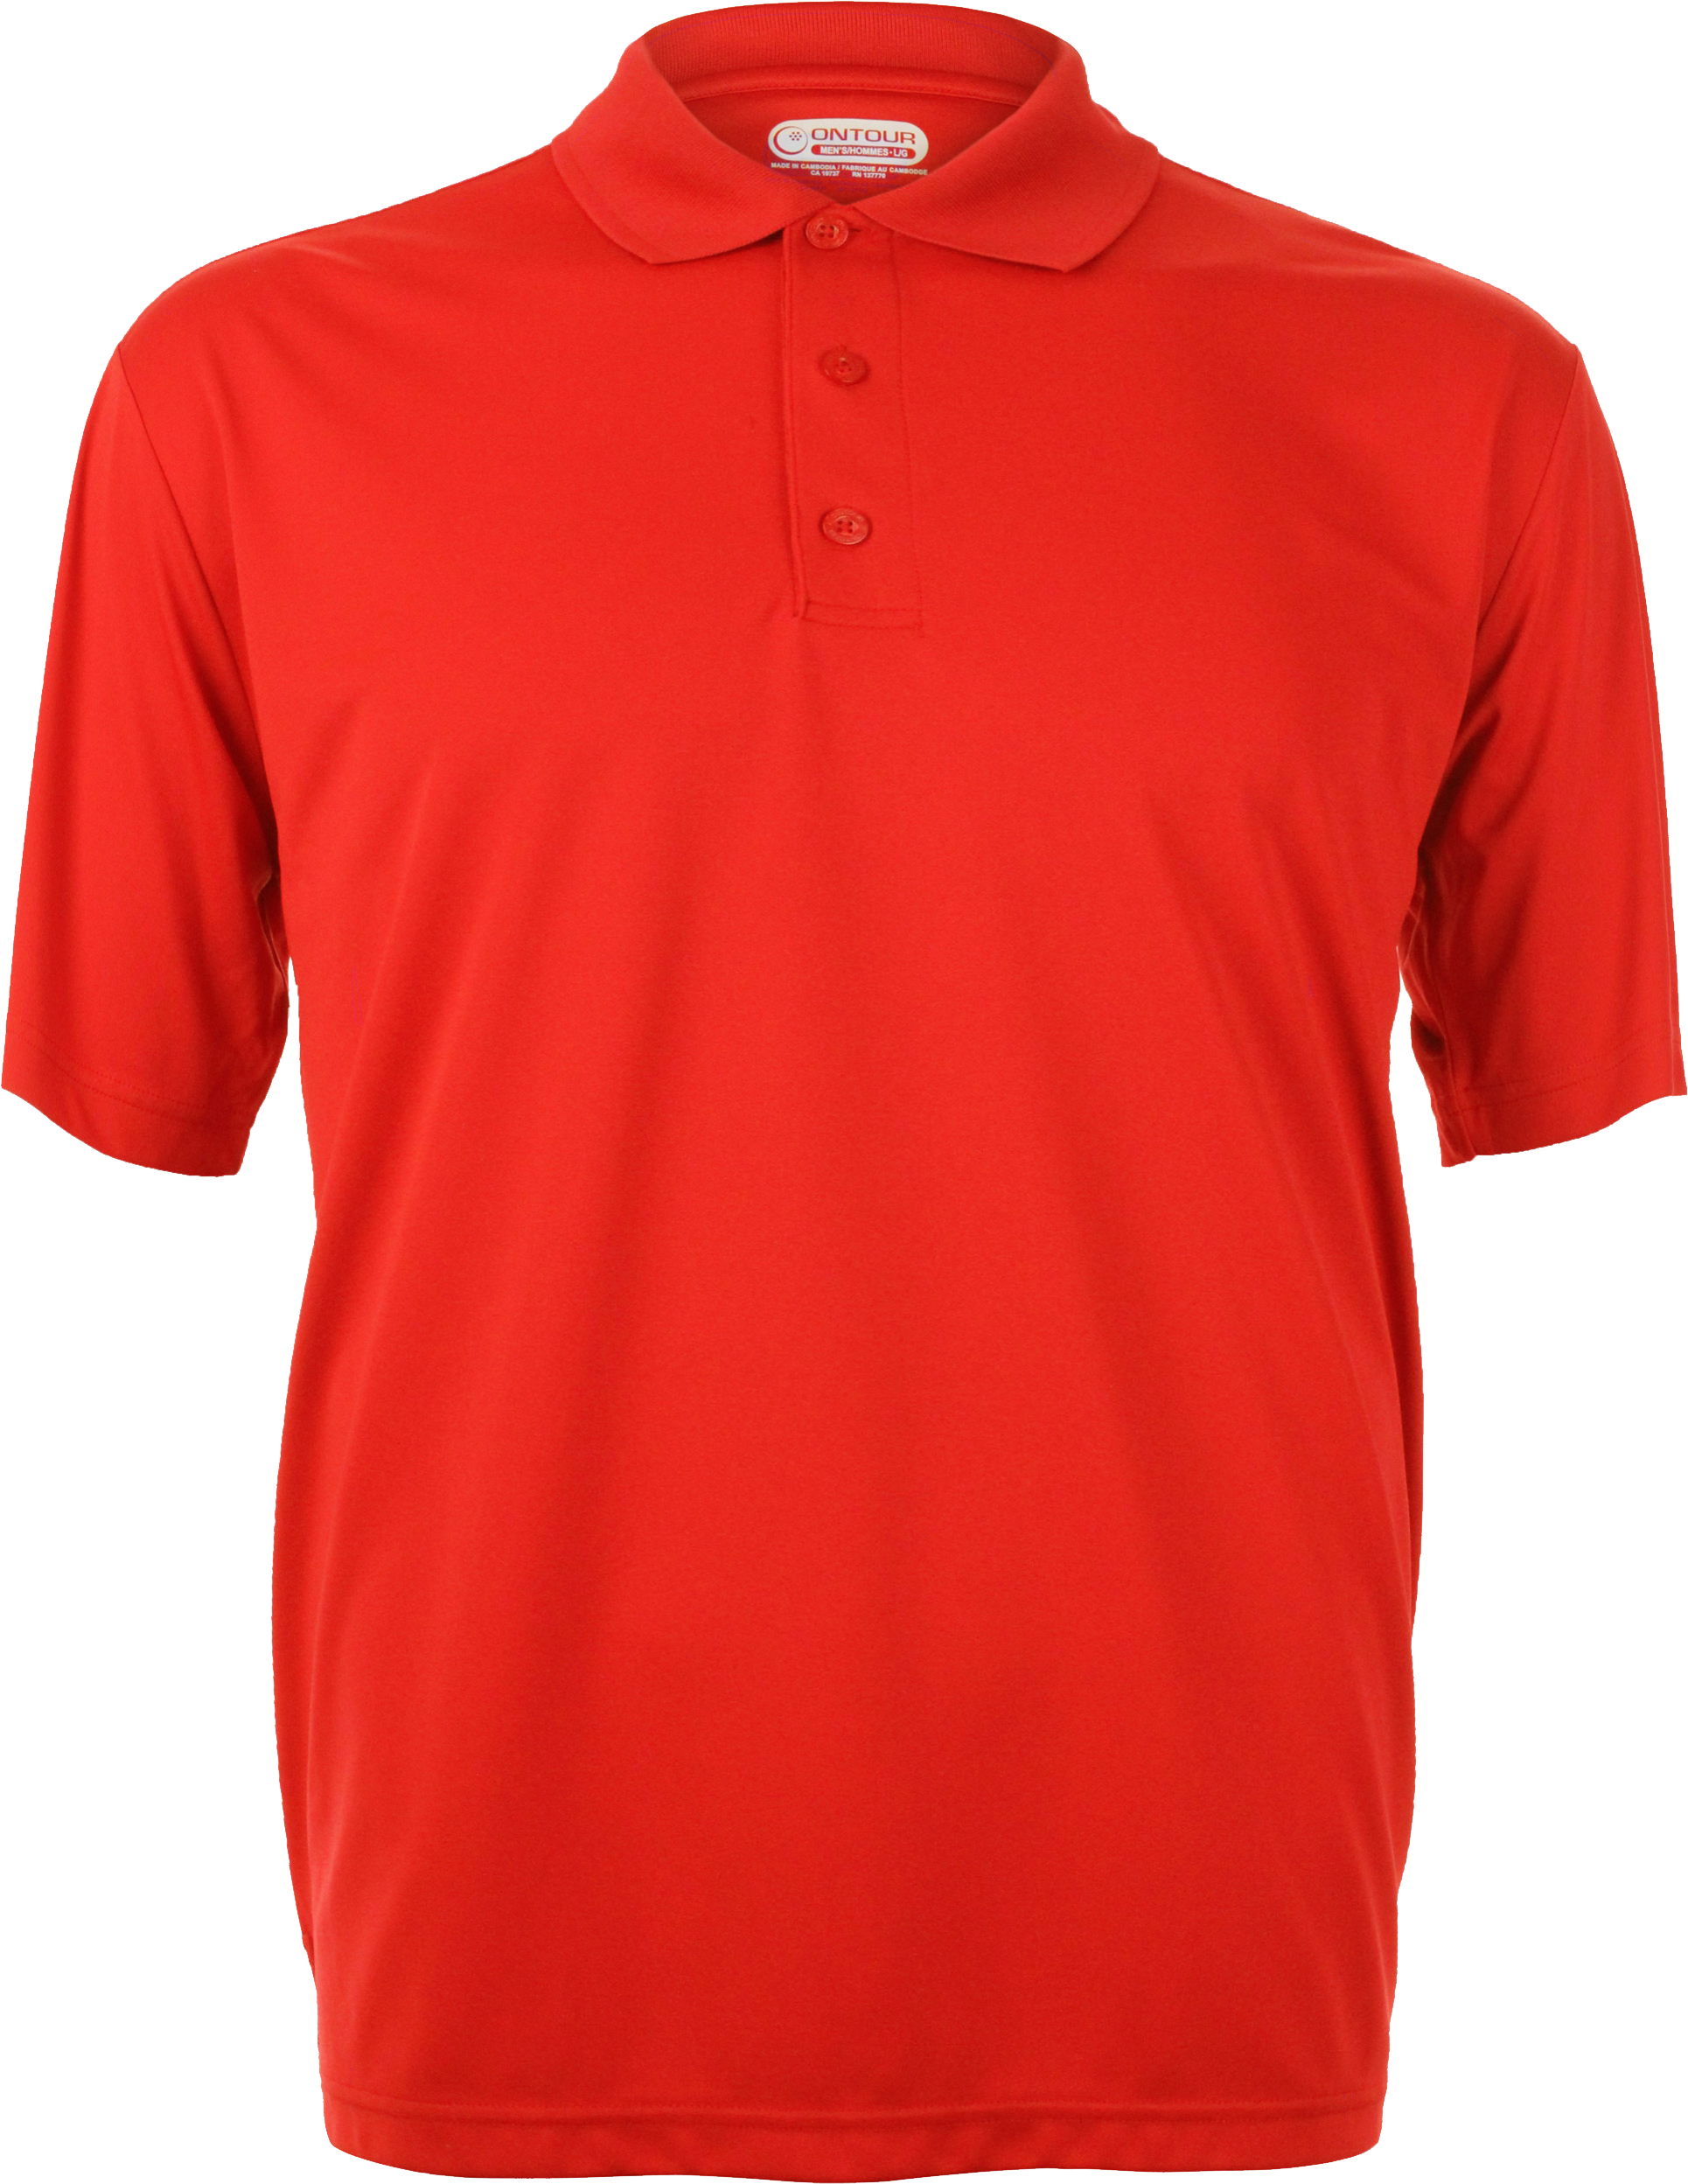 Polo Shirt Png Image - Polo Shirt, Transparent background PNG HD thumbnail